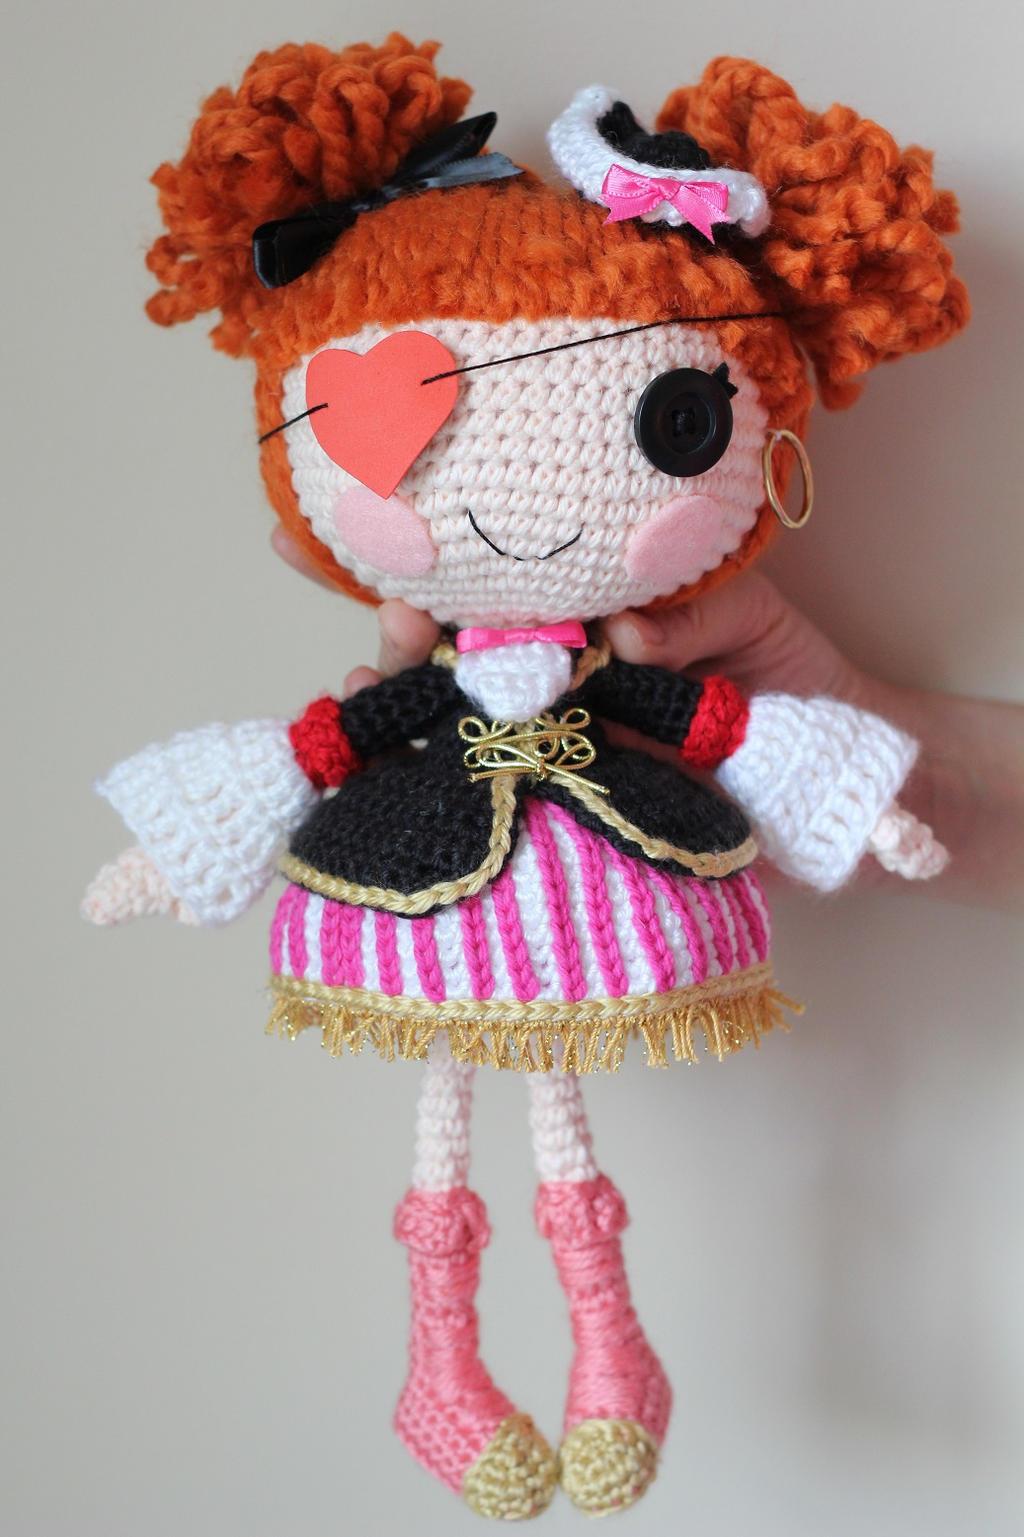 Crochet Pattern Lalaloopsy Doll : LALALOOPSY Peggy Seven Seas Crochet Amigurumi Doll by ...